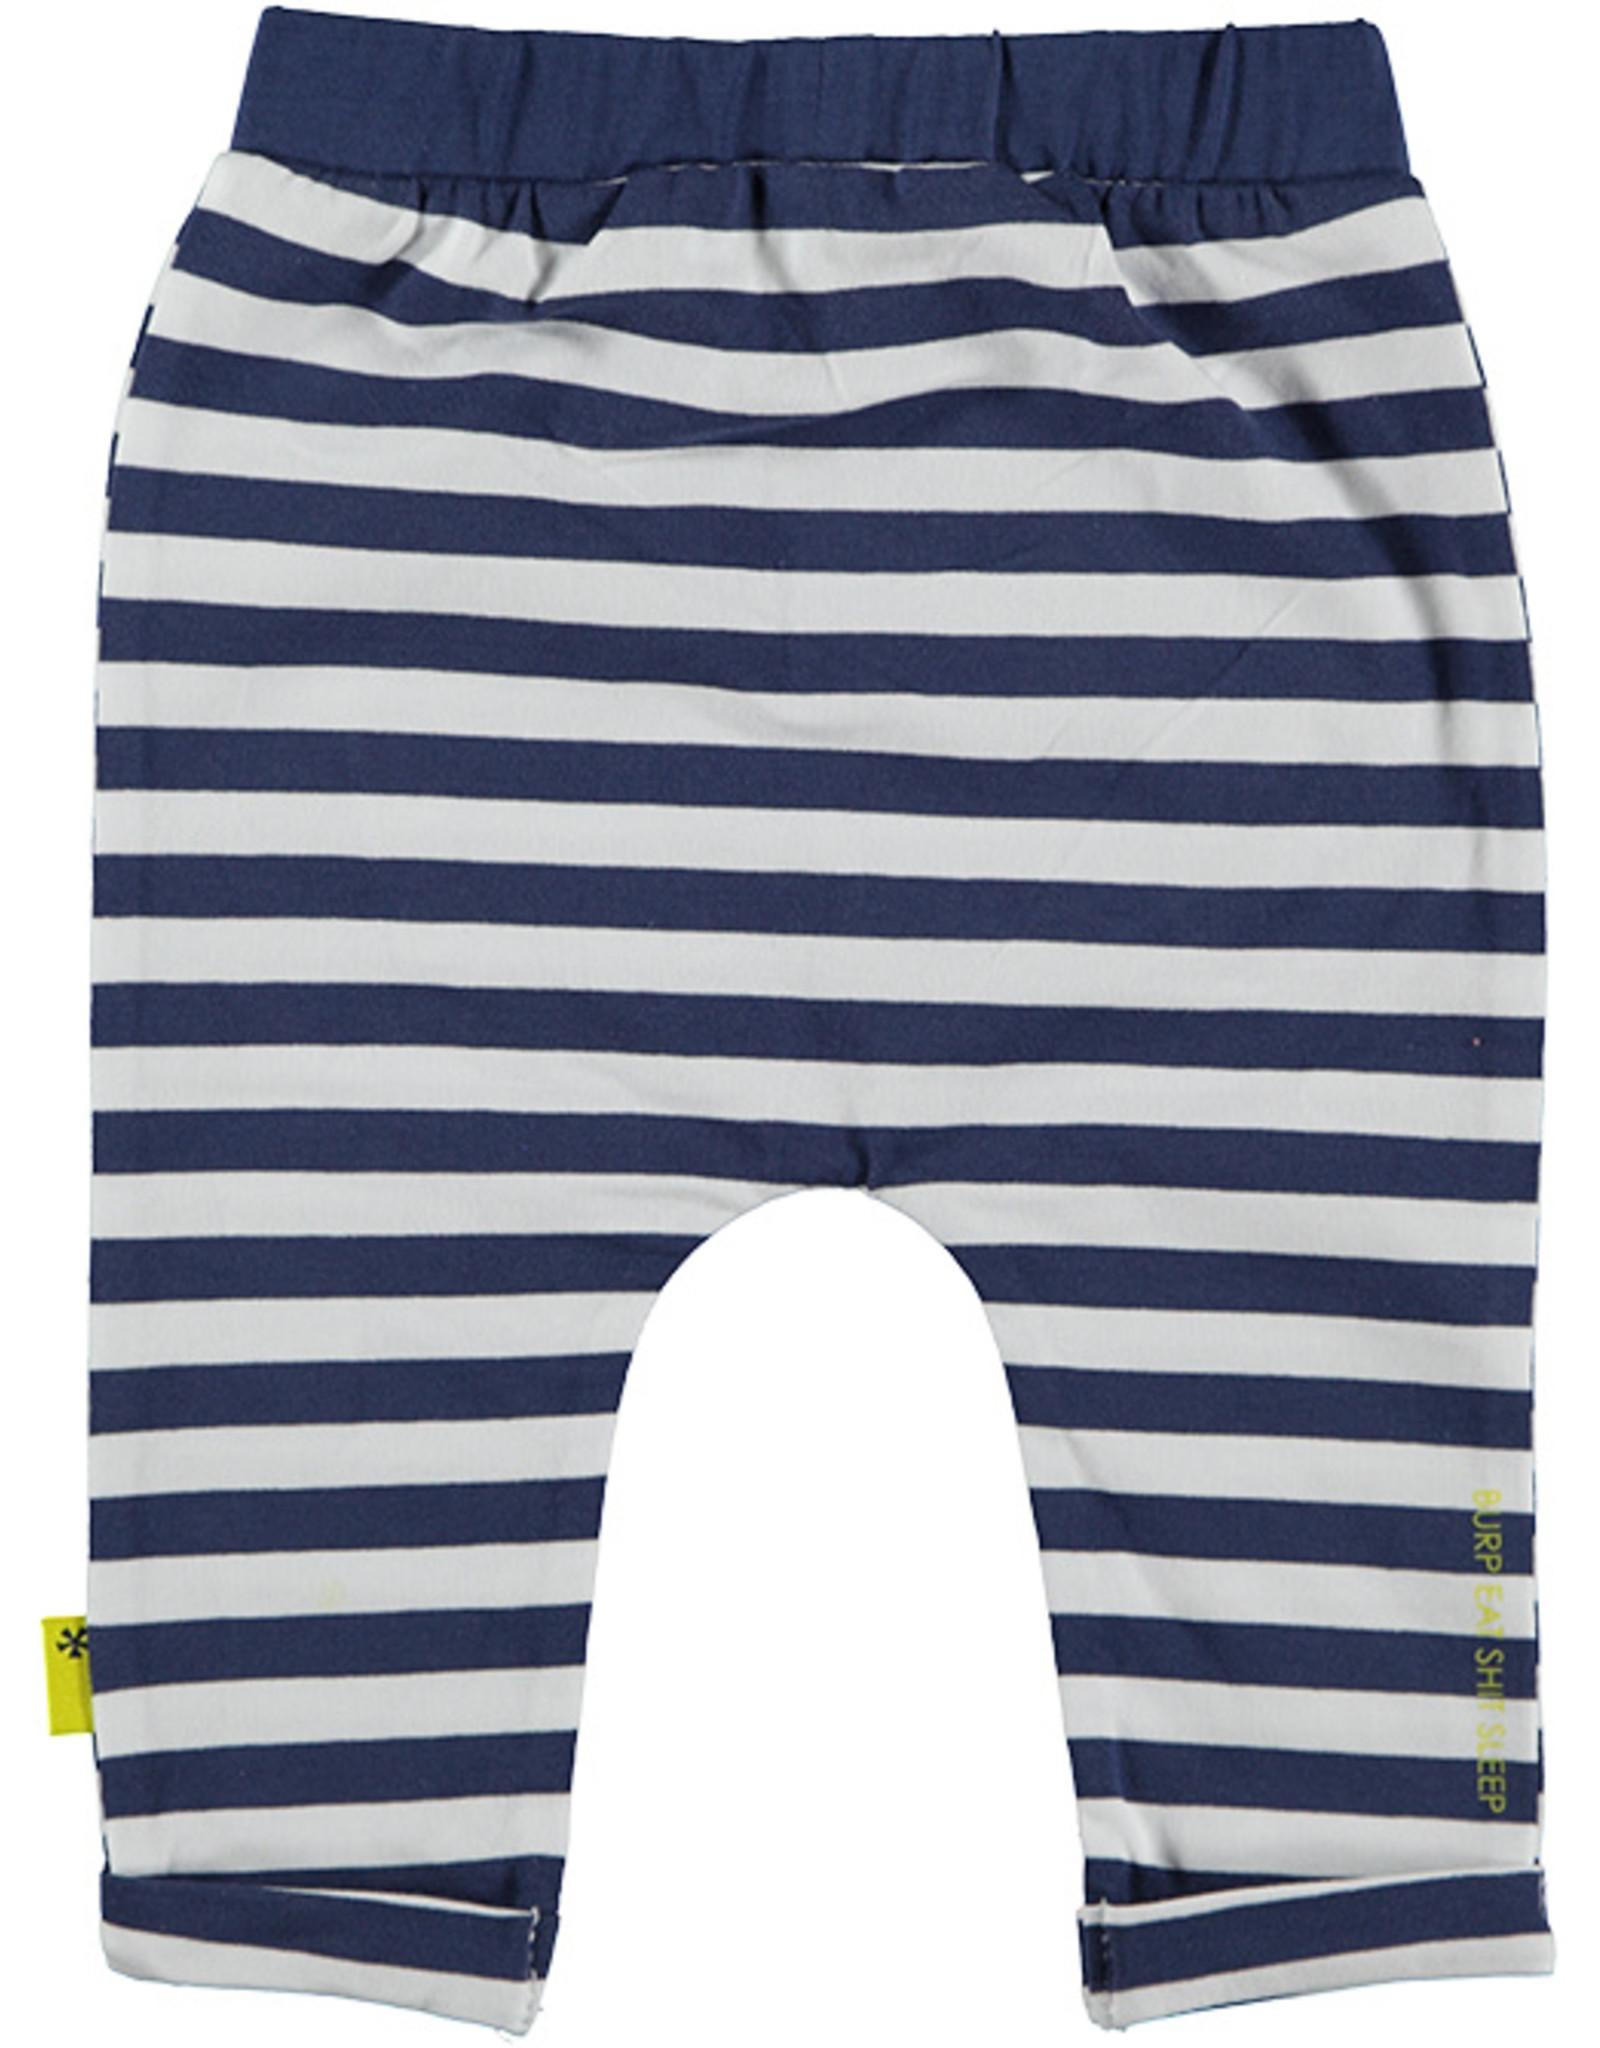 B.E.S.S. Pants AOP Striped with Pocket, Blue